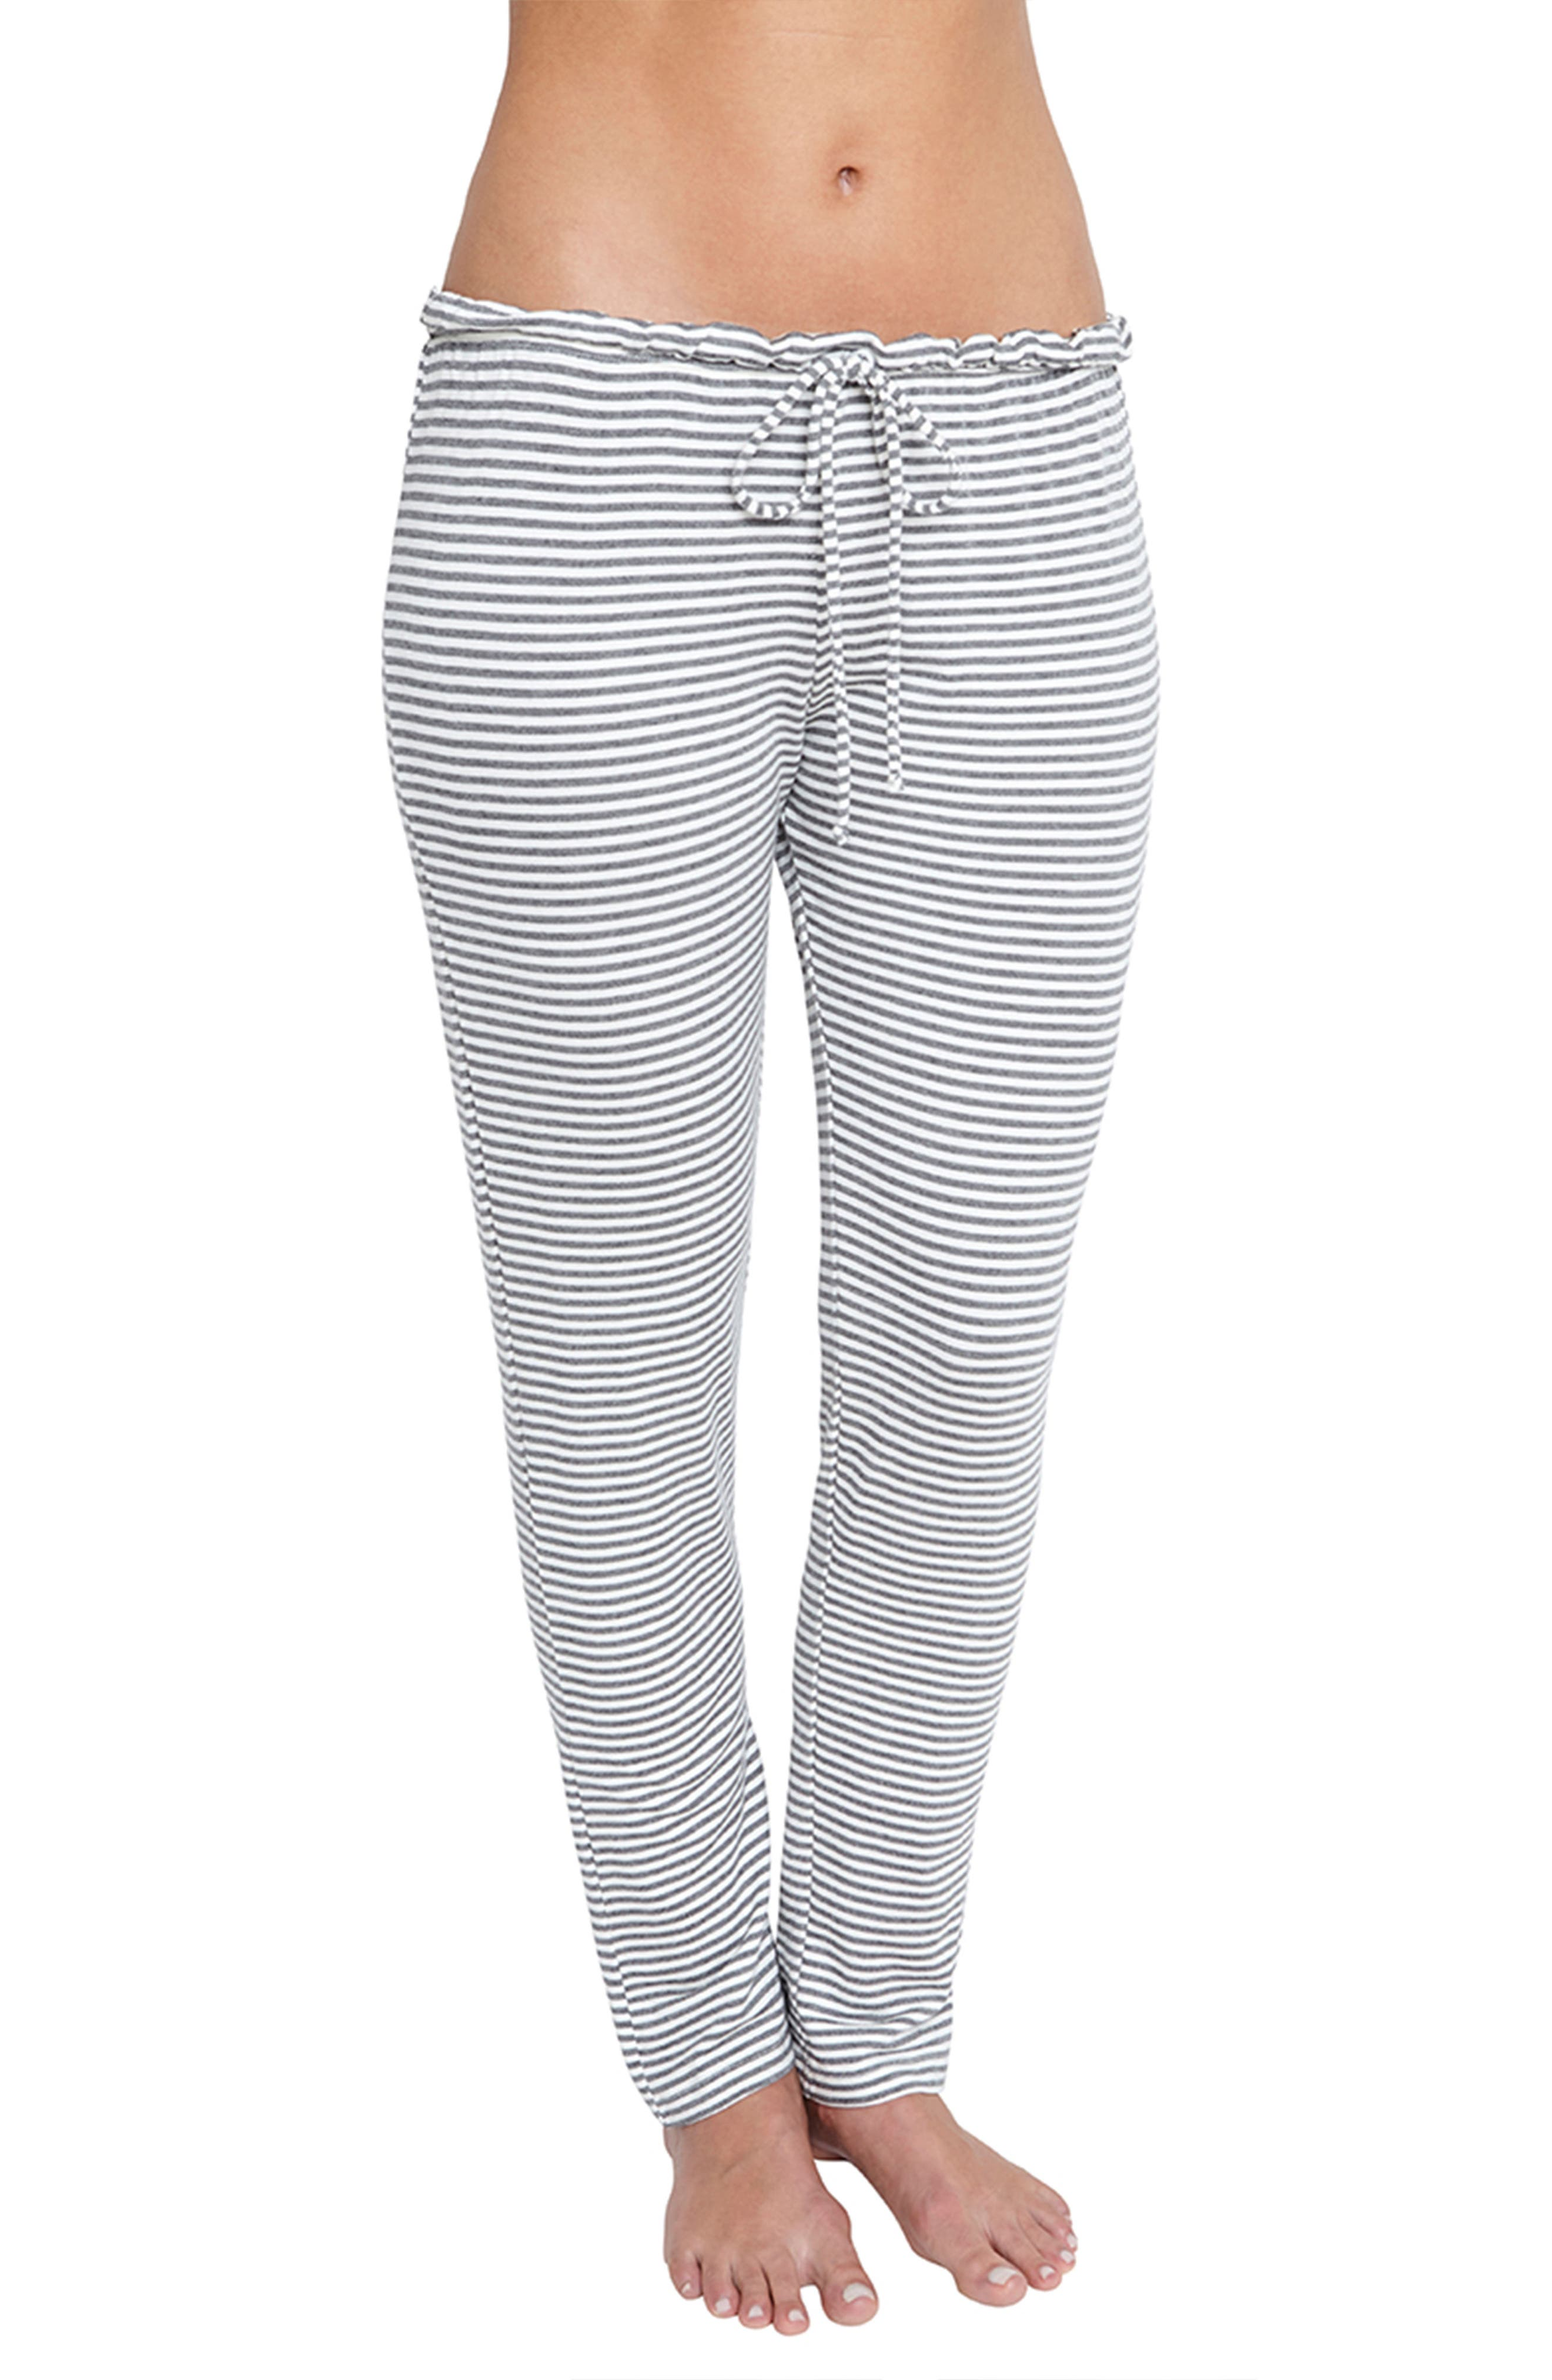 Sadie Stripes Pajama Pants,                             Main thumbnail 1, color,                             030